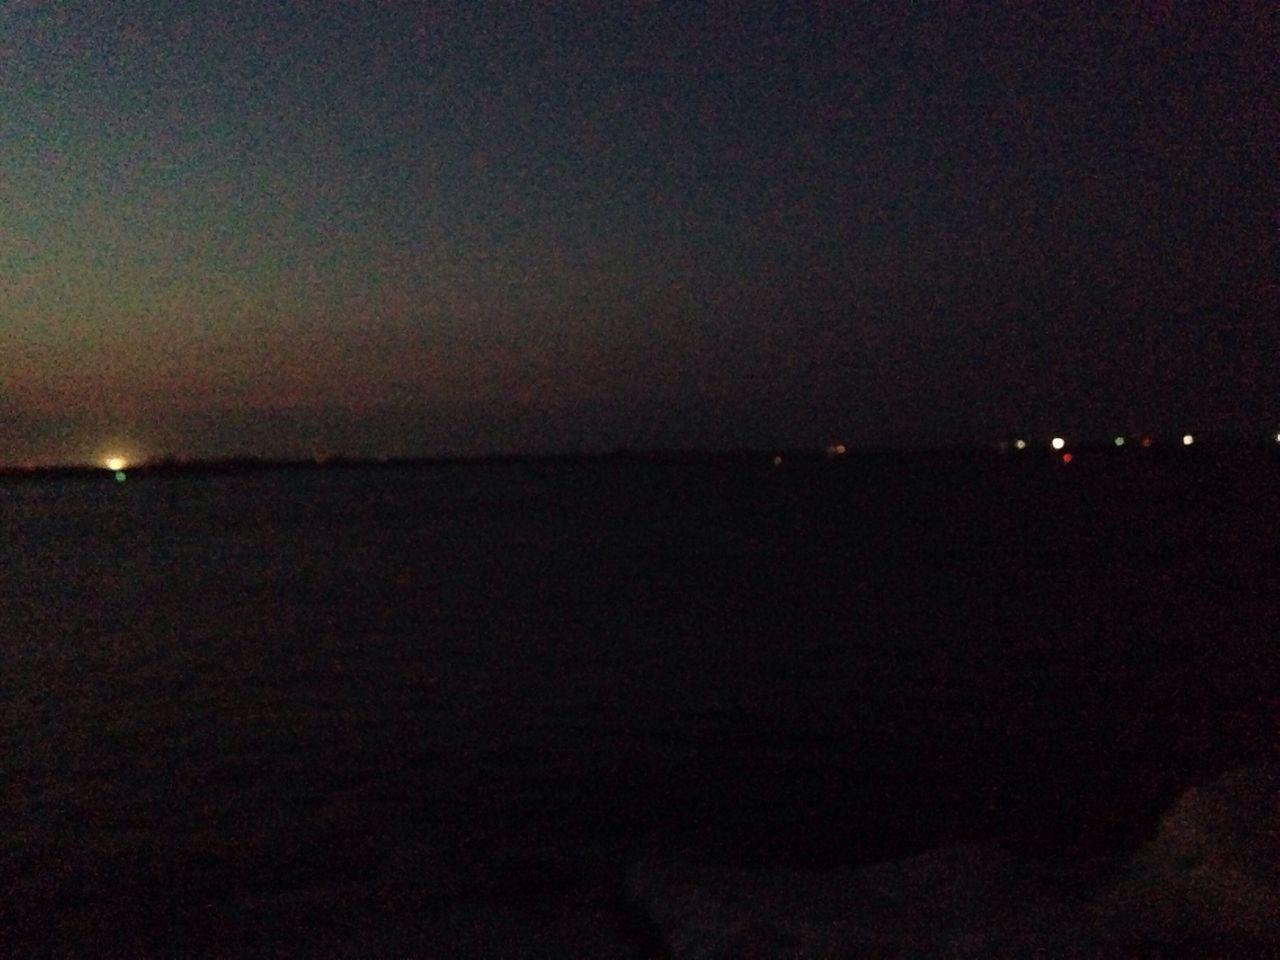 night, illuminated, sky, nature, scenics, sea, no people, outdoors, beauty in nature, water